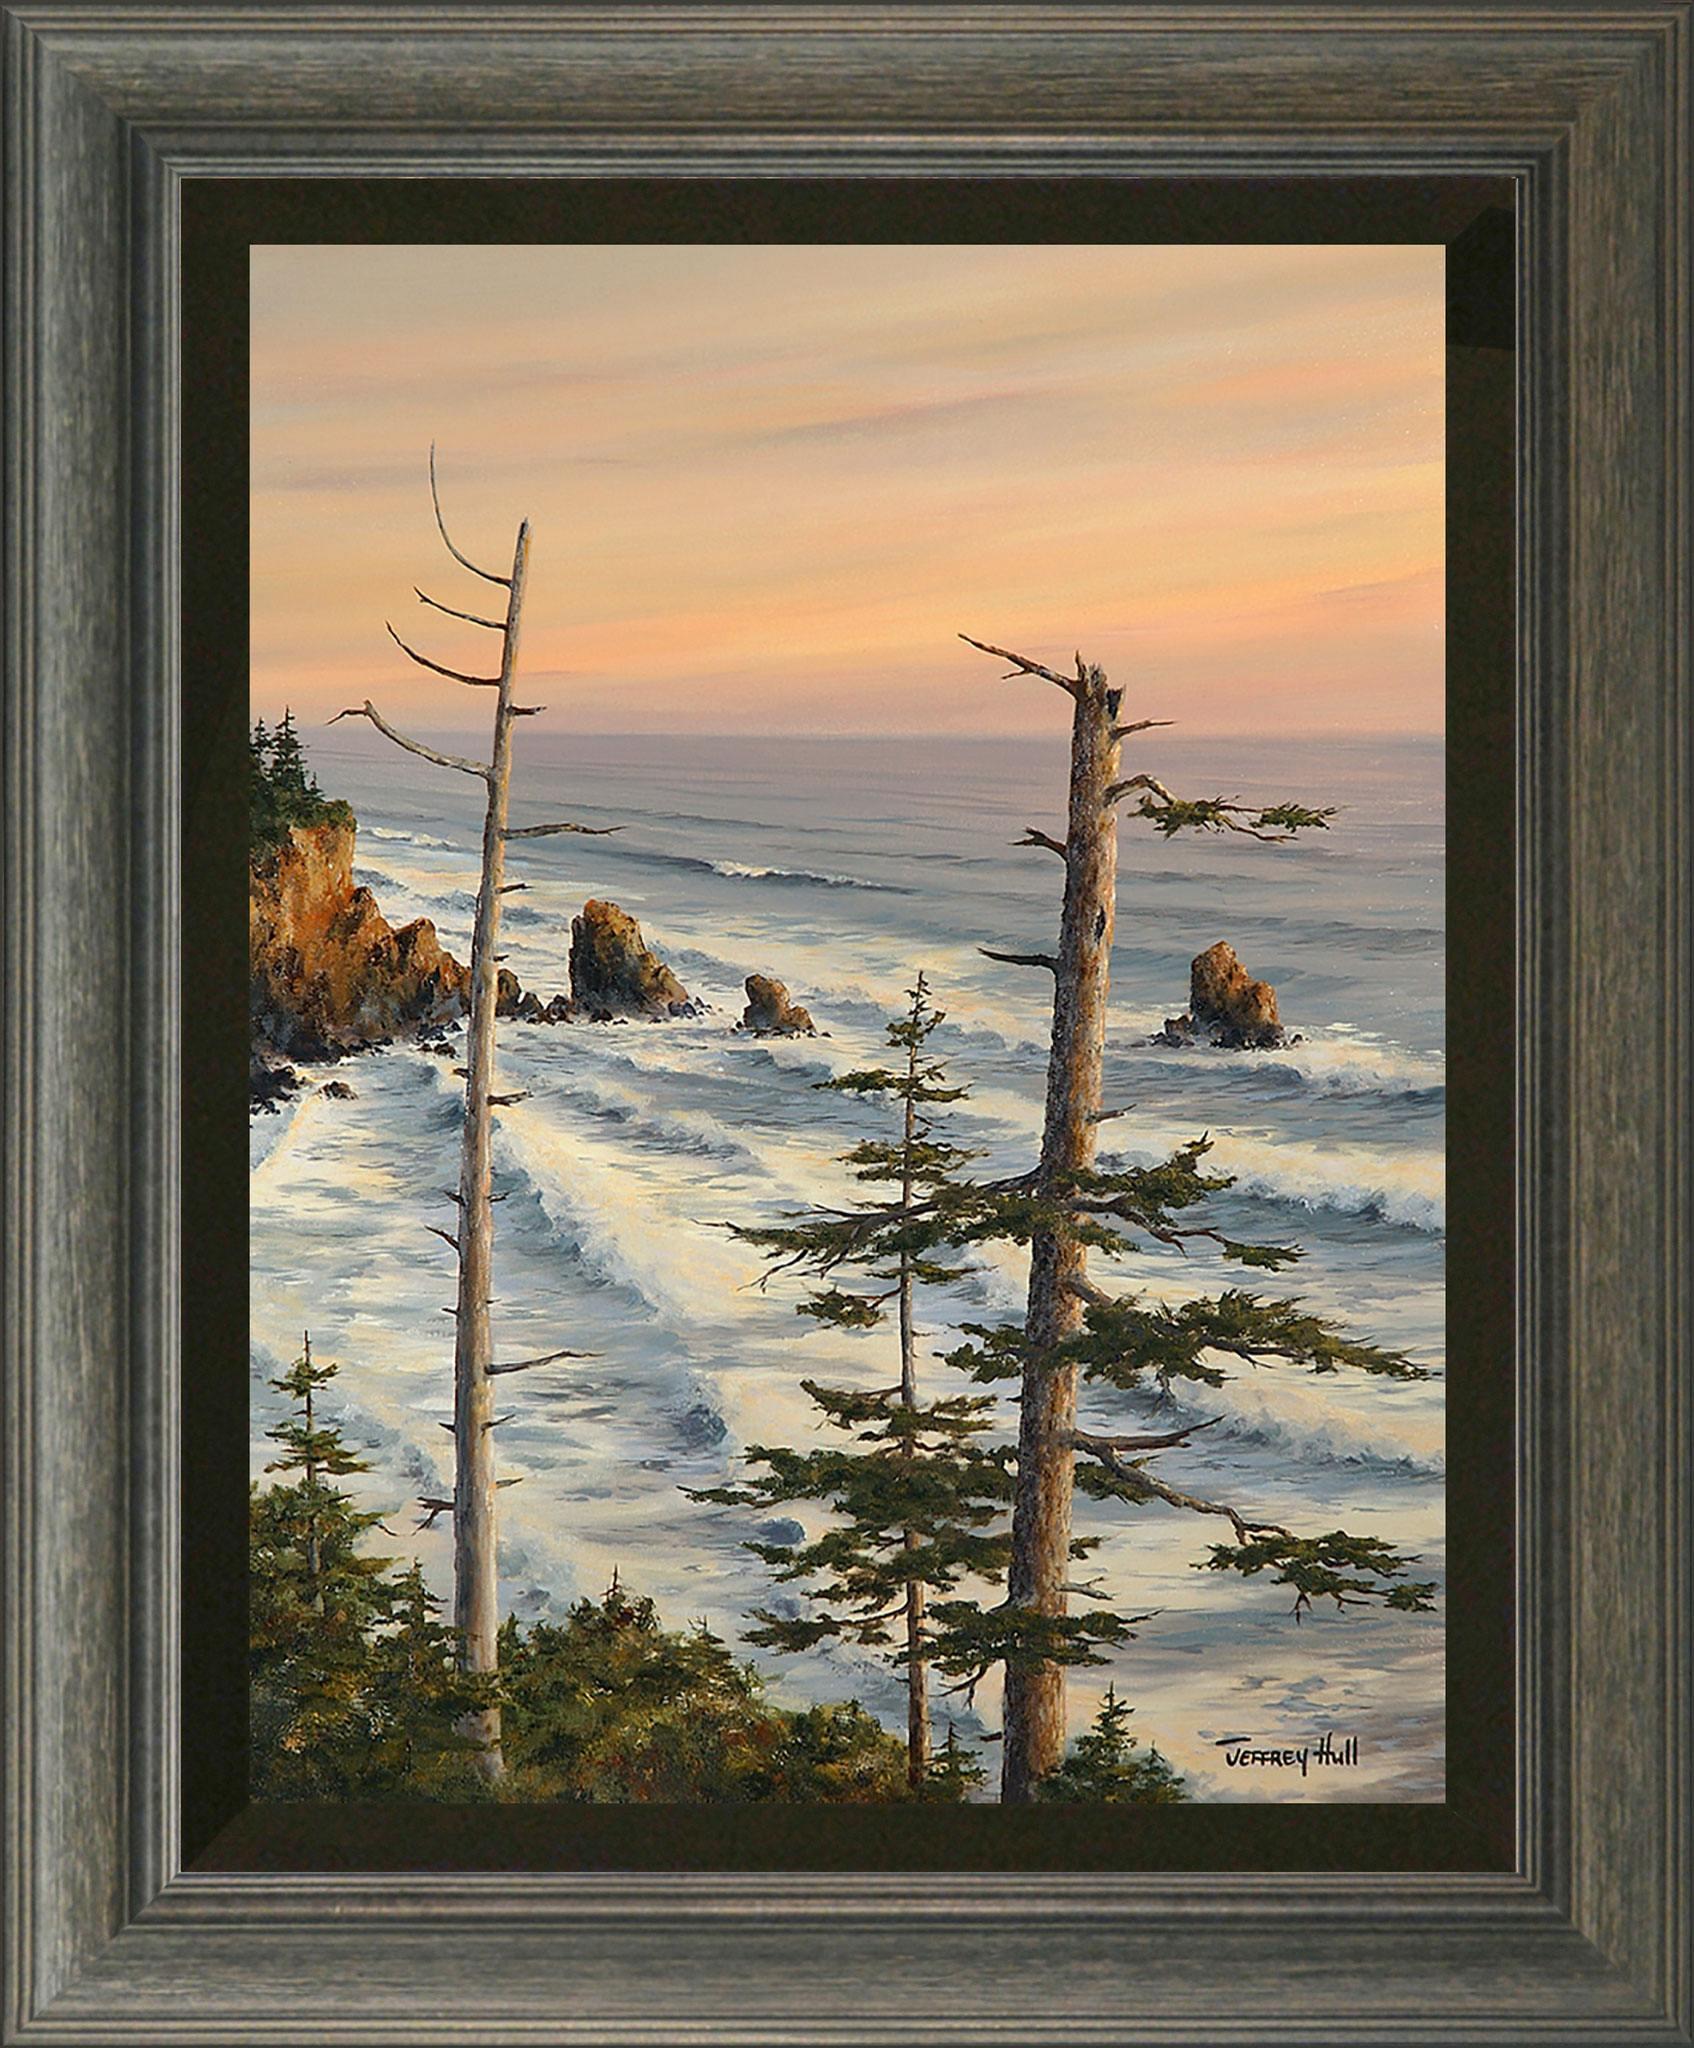 Sunset-Cliffs-OpenEd-Cascade-Black-Liner-4-Website-2021